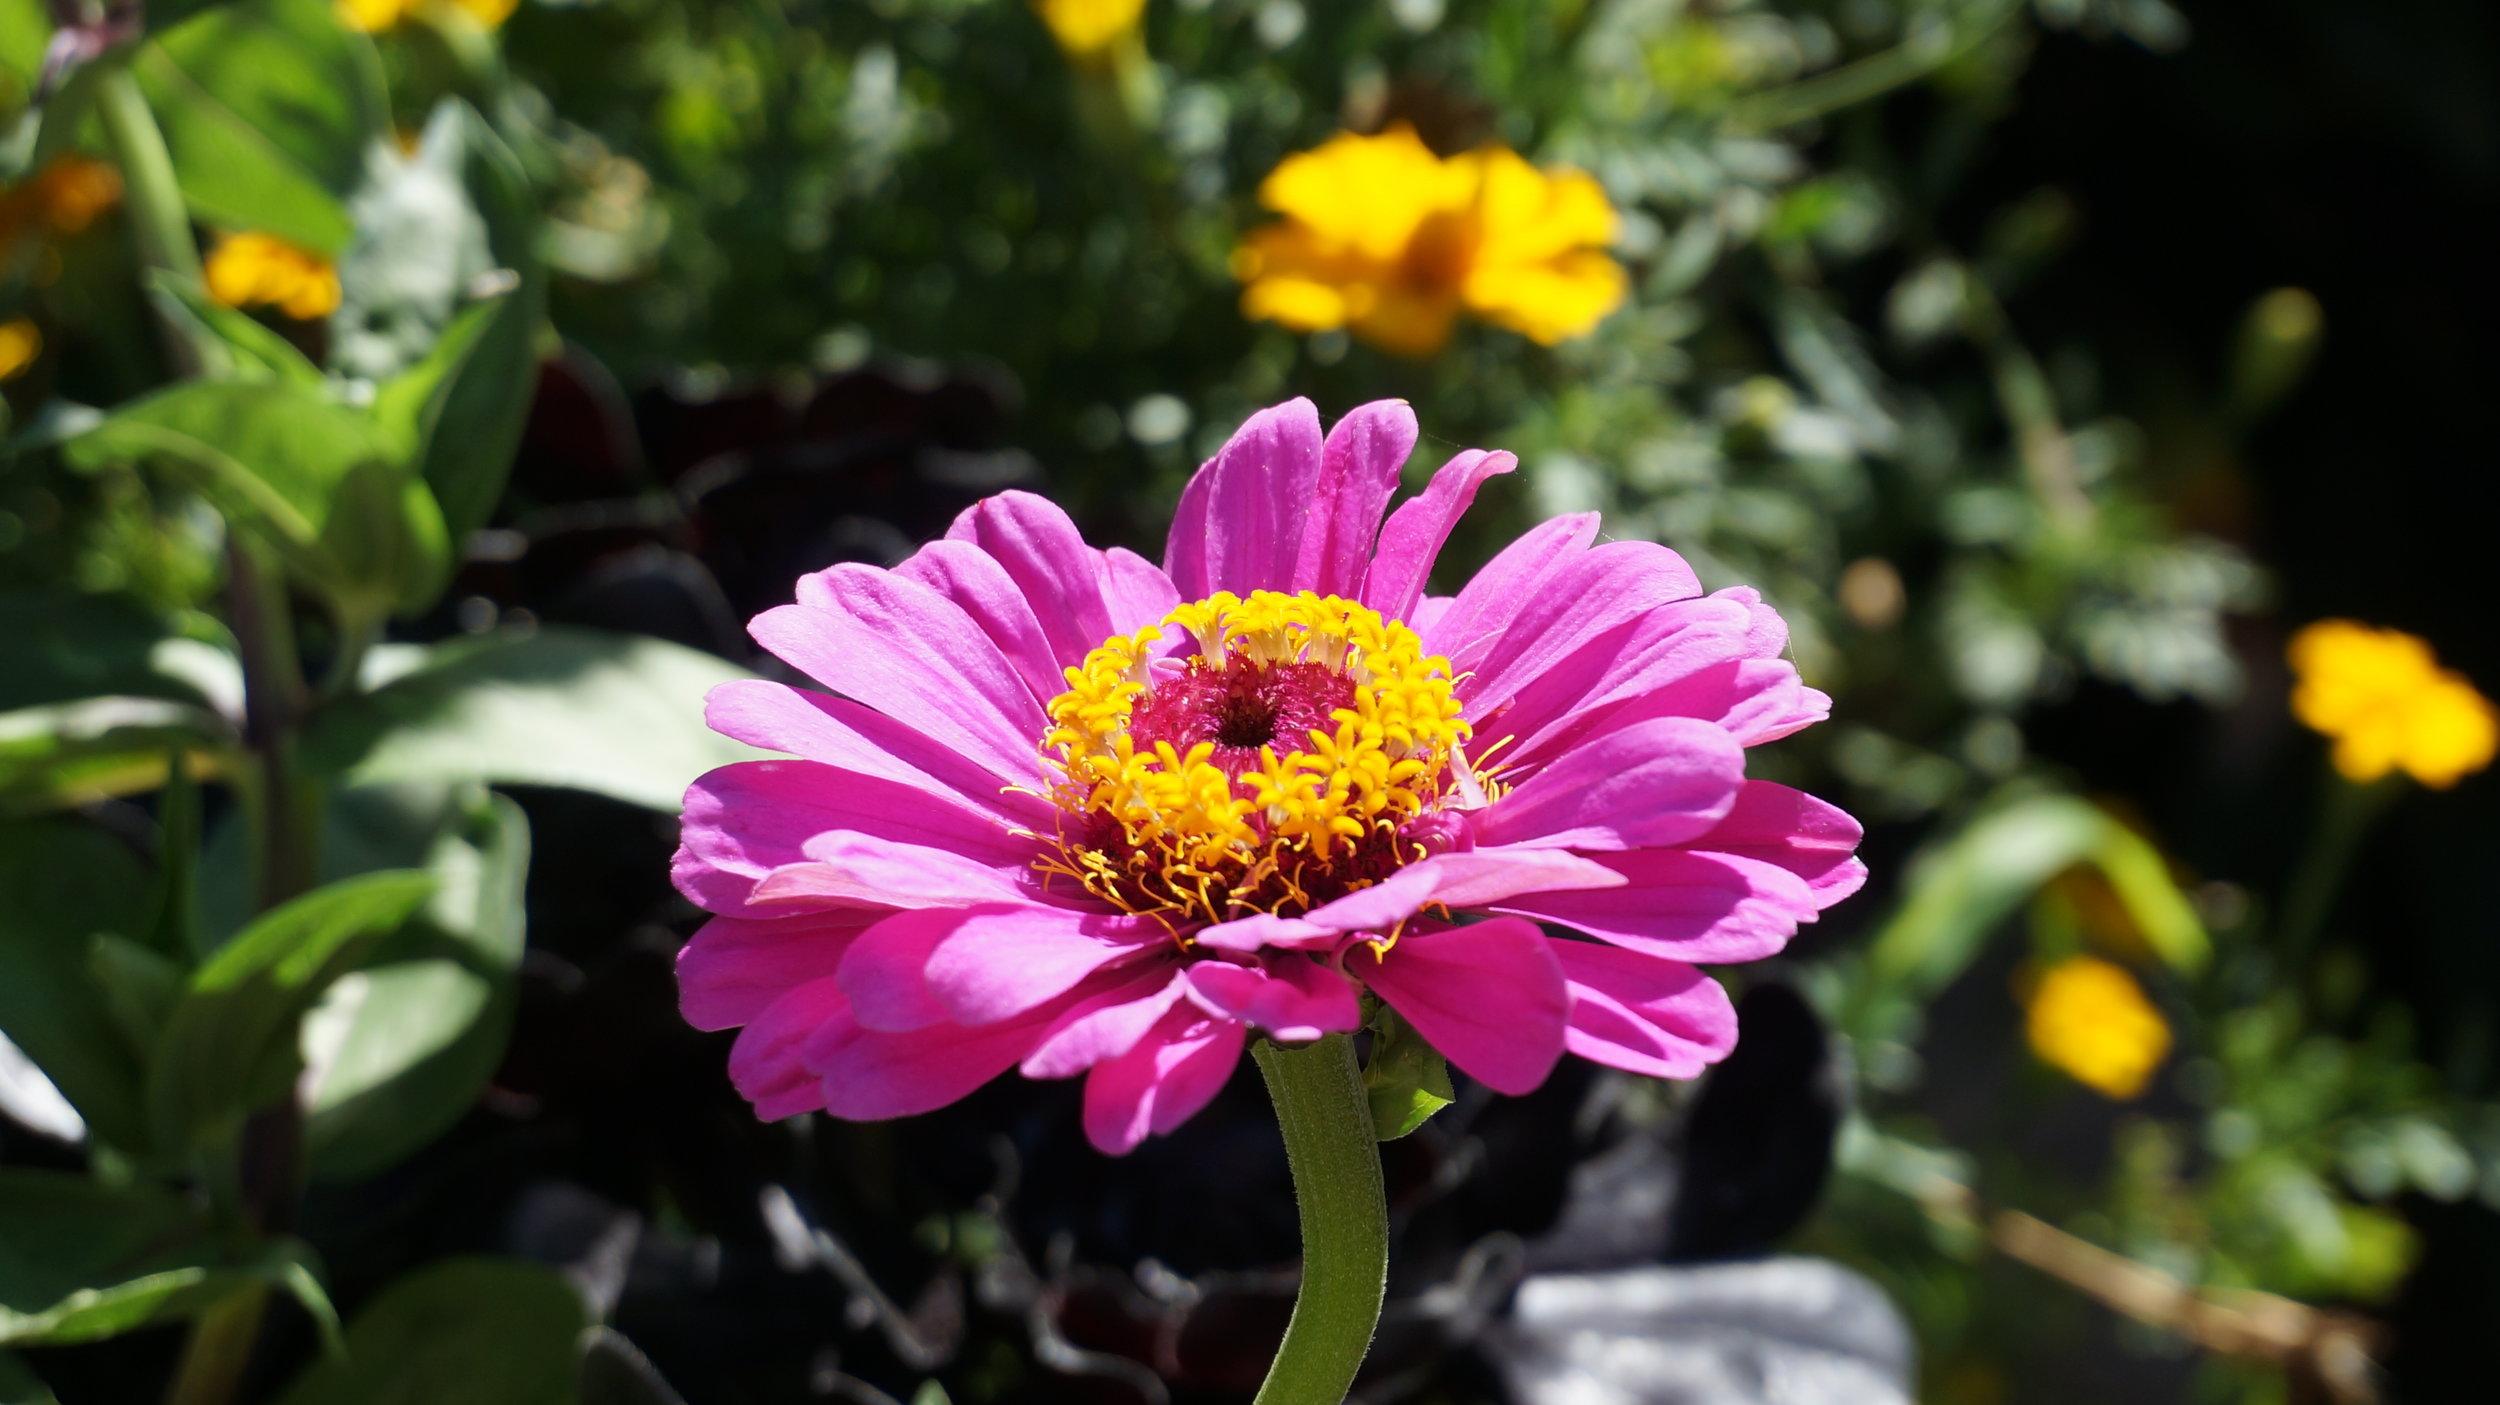 pinksunflower.jpg